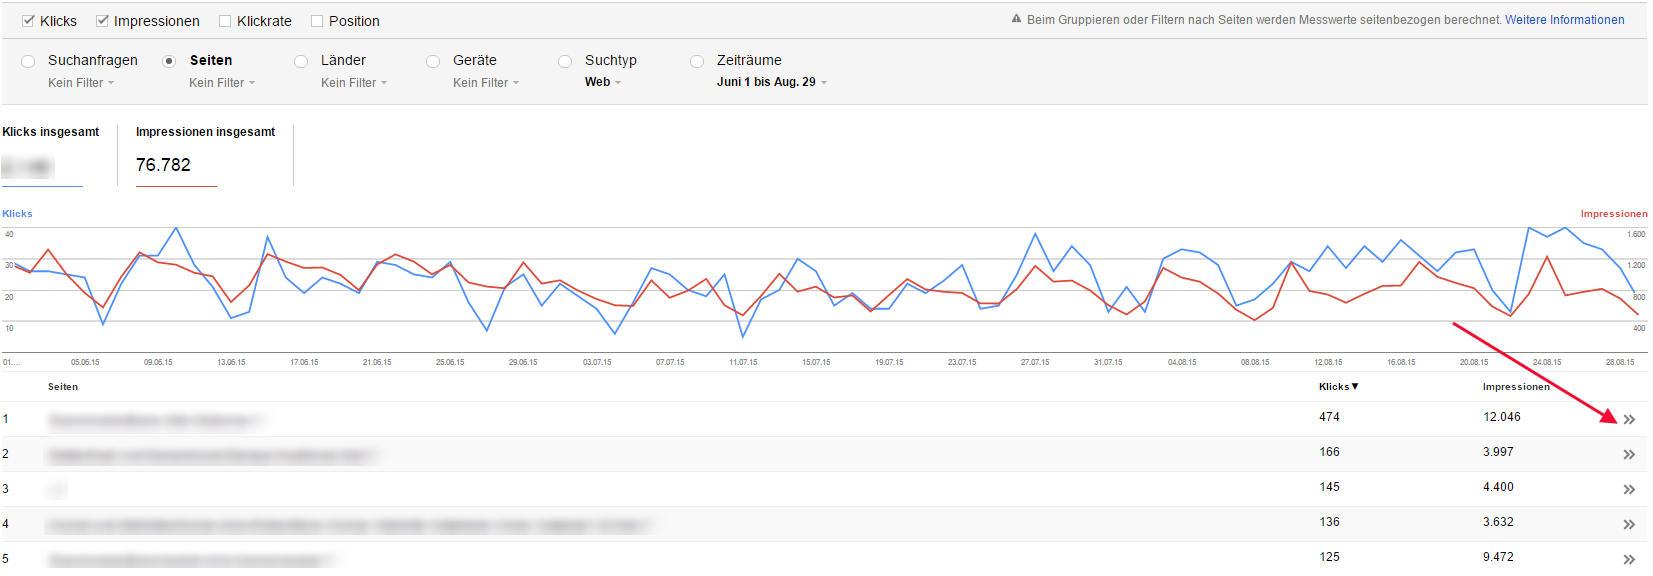 Keyword-Analyse Google Search Console Seitenimpressionen